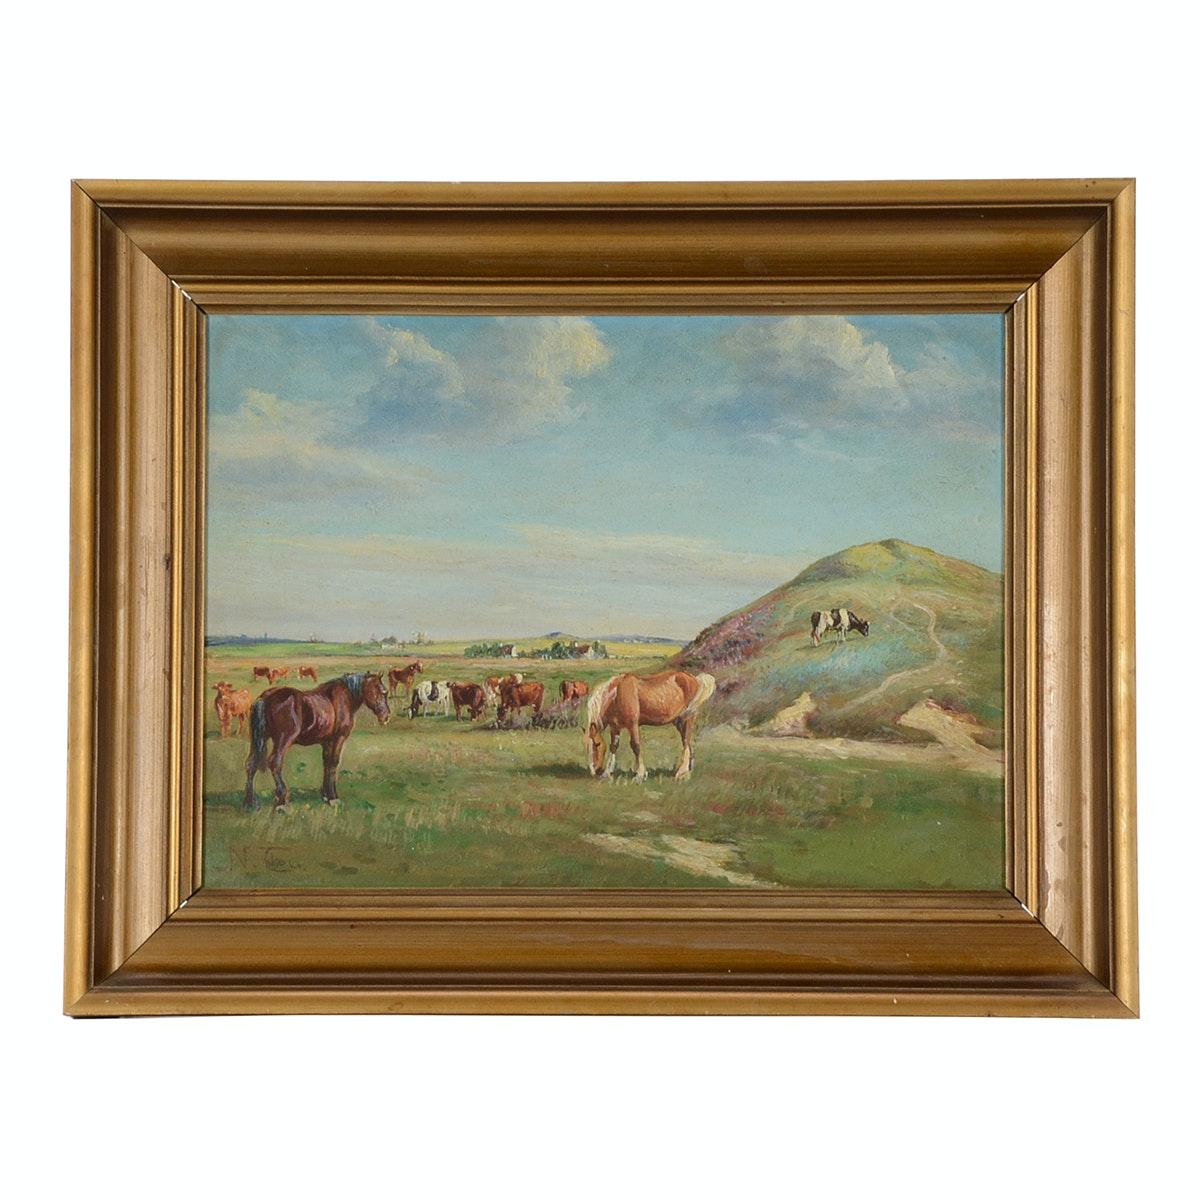 Niels Christiansen Original Pastoral Oil Painting on Canvas